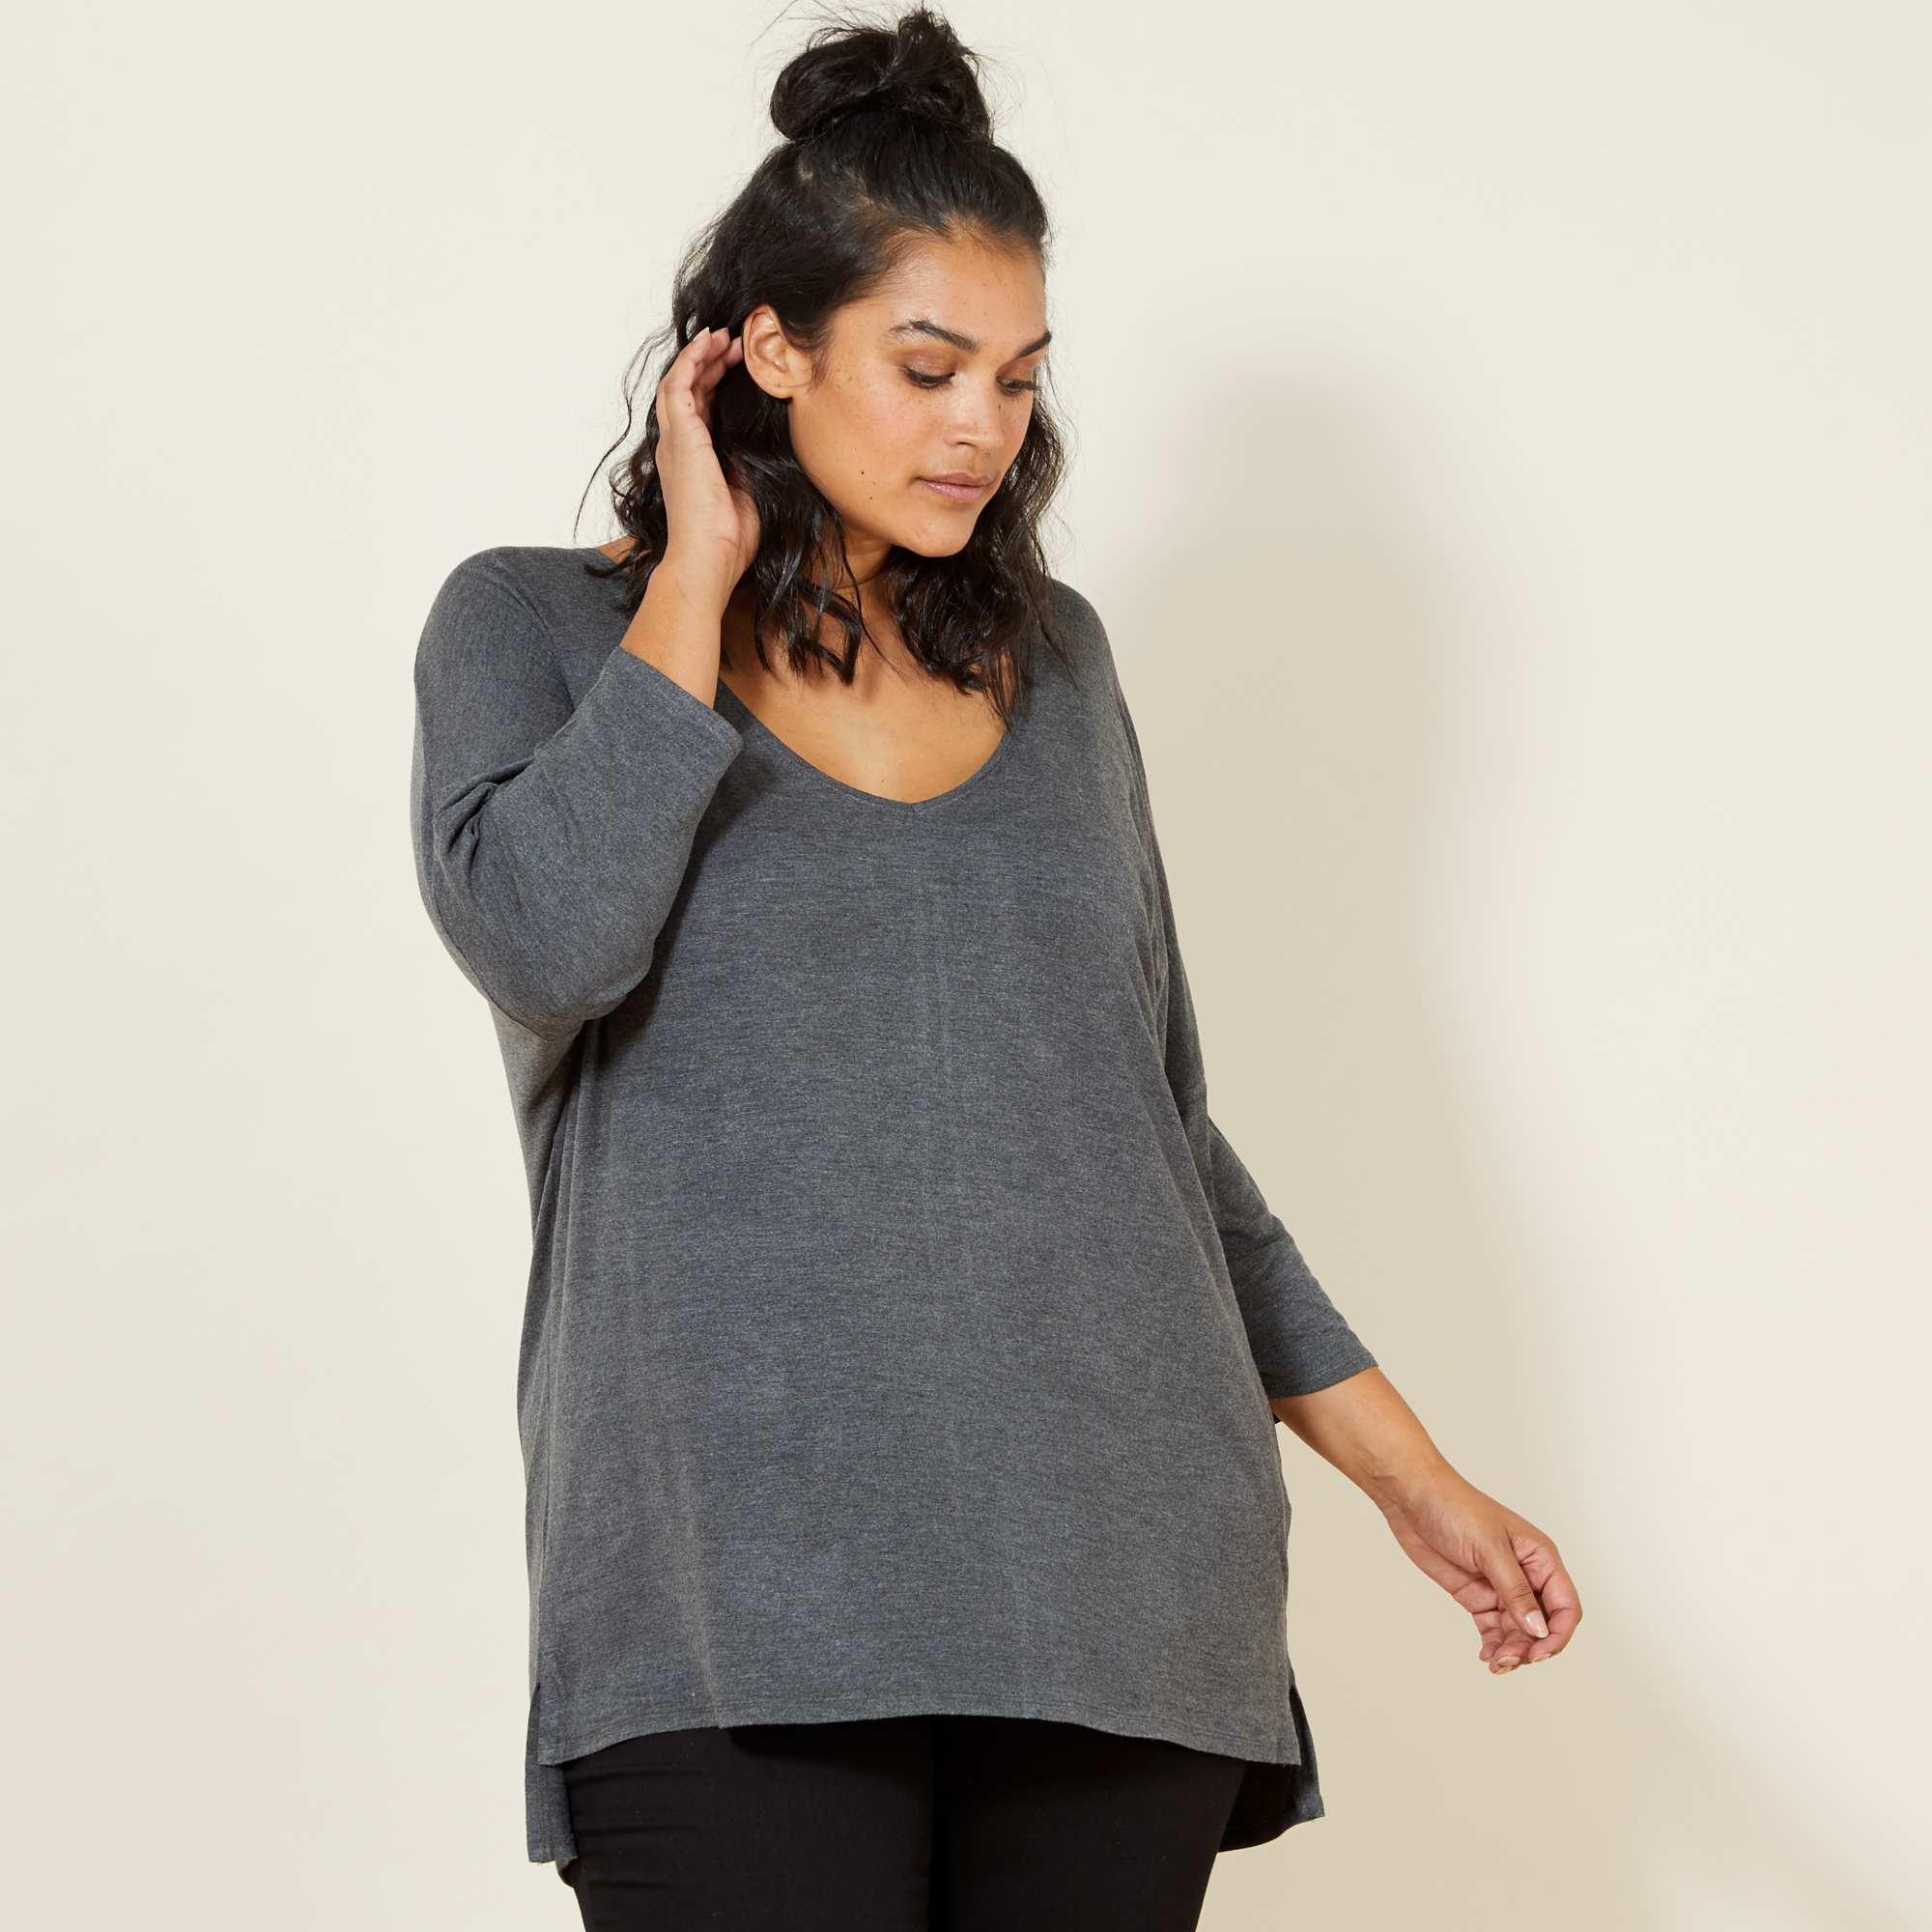 tee shirt fluide manches chauve souris grande taille femme. Black Bedroom Furniture Sets. Home Design Ideas